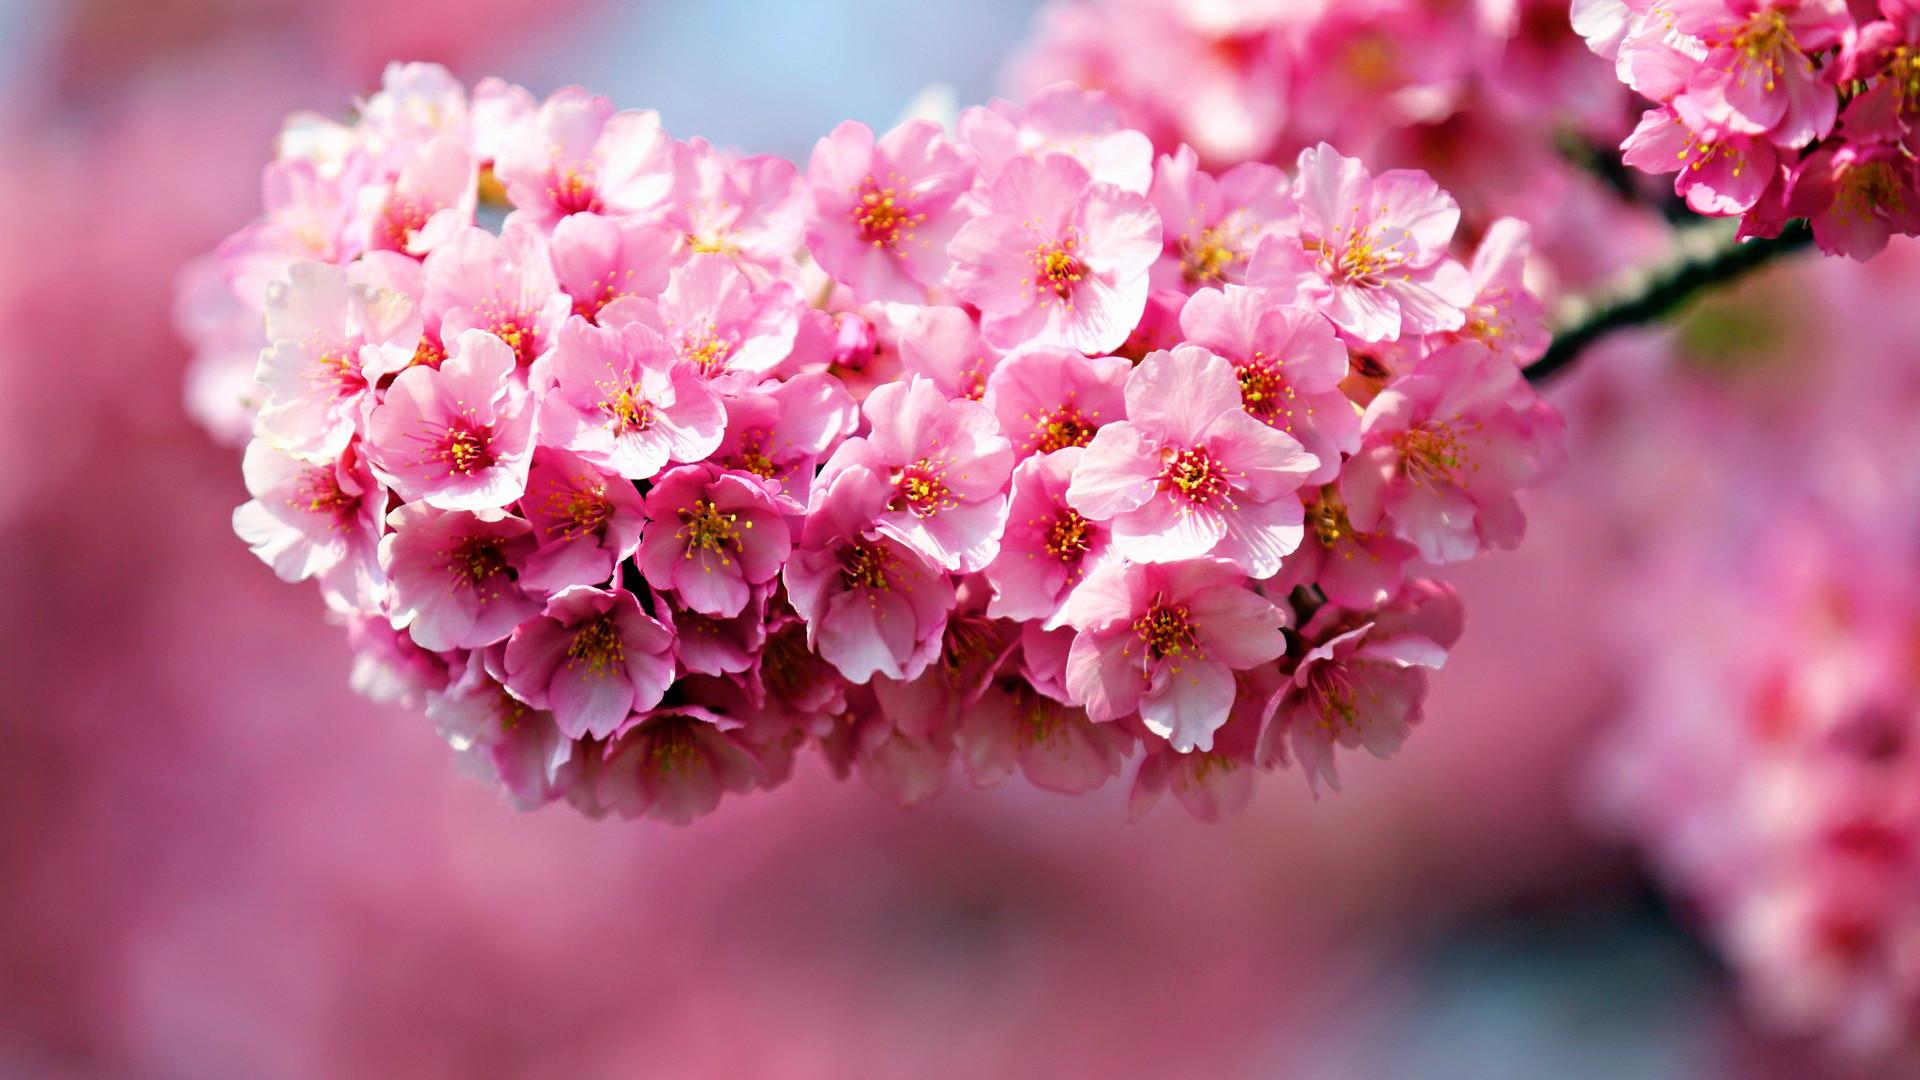 1920x1080 40 Beautiful Flower Wallpapers For Your Desktop